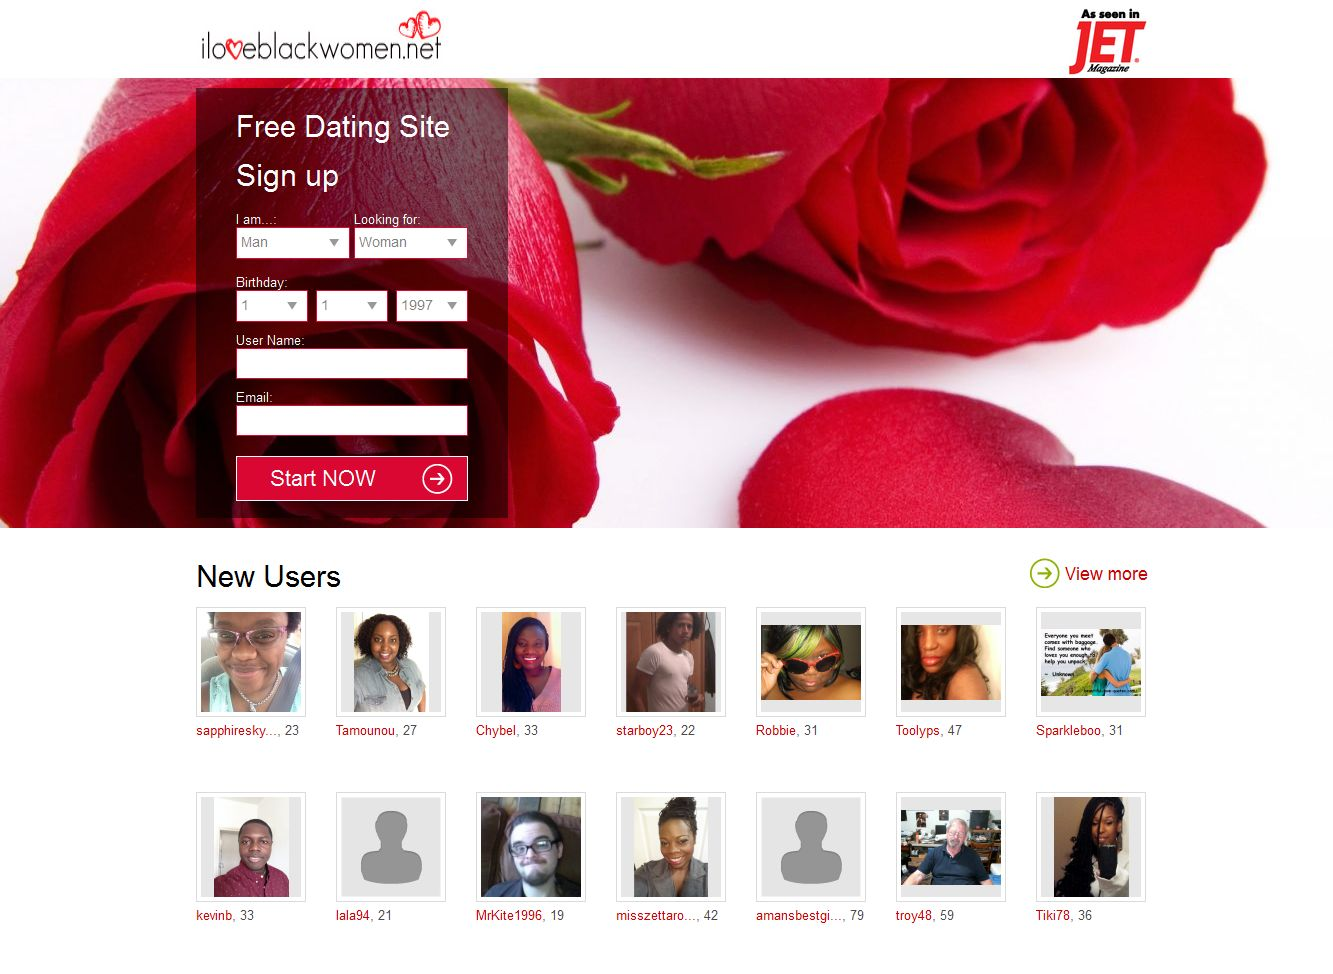 ILoveBlackWomen.net